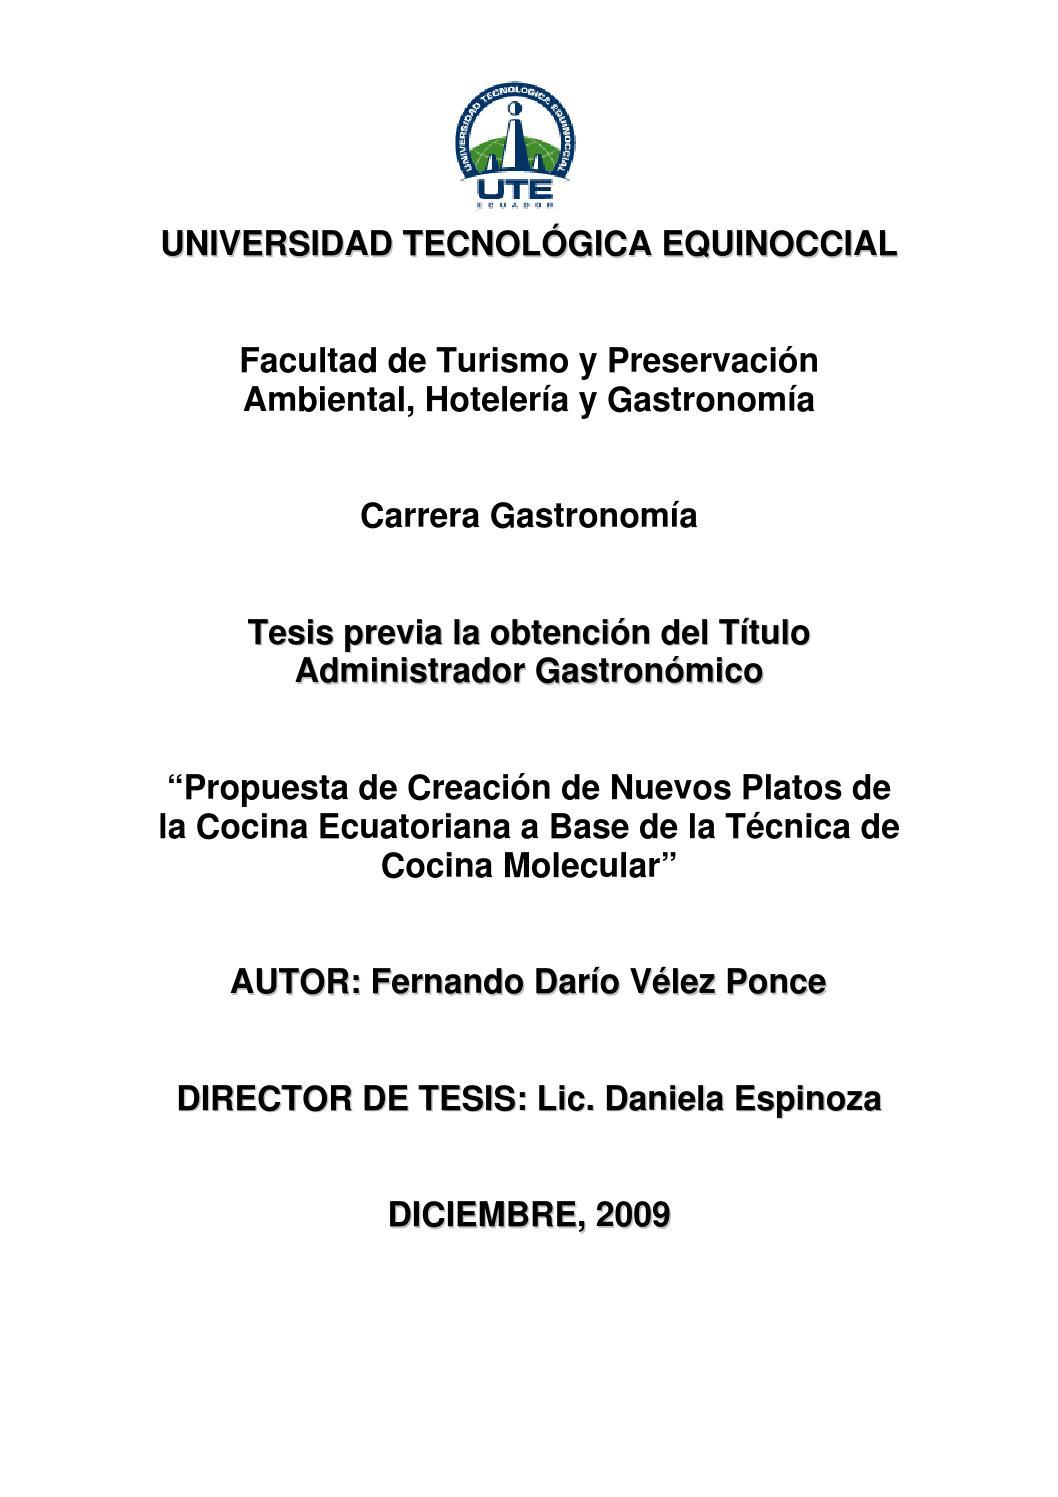 Creaci n de nuevos platos de la cocina ecuatoriana a base for Tecnicas de cocina molecular